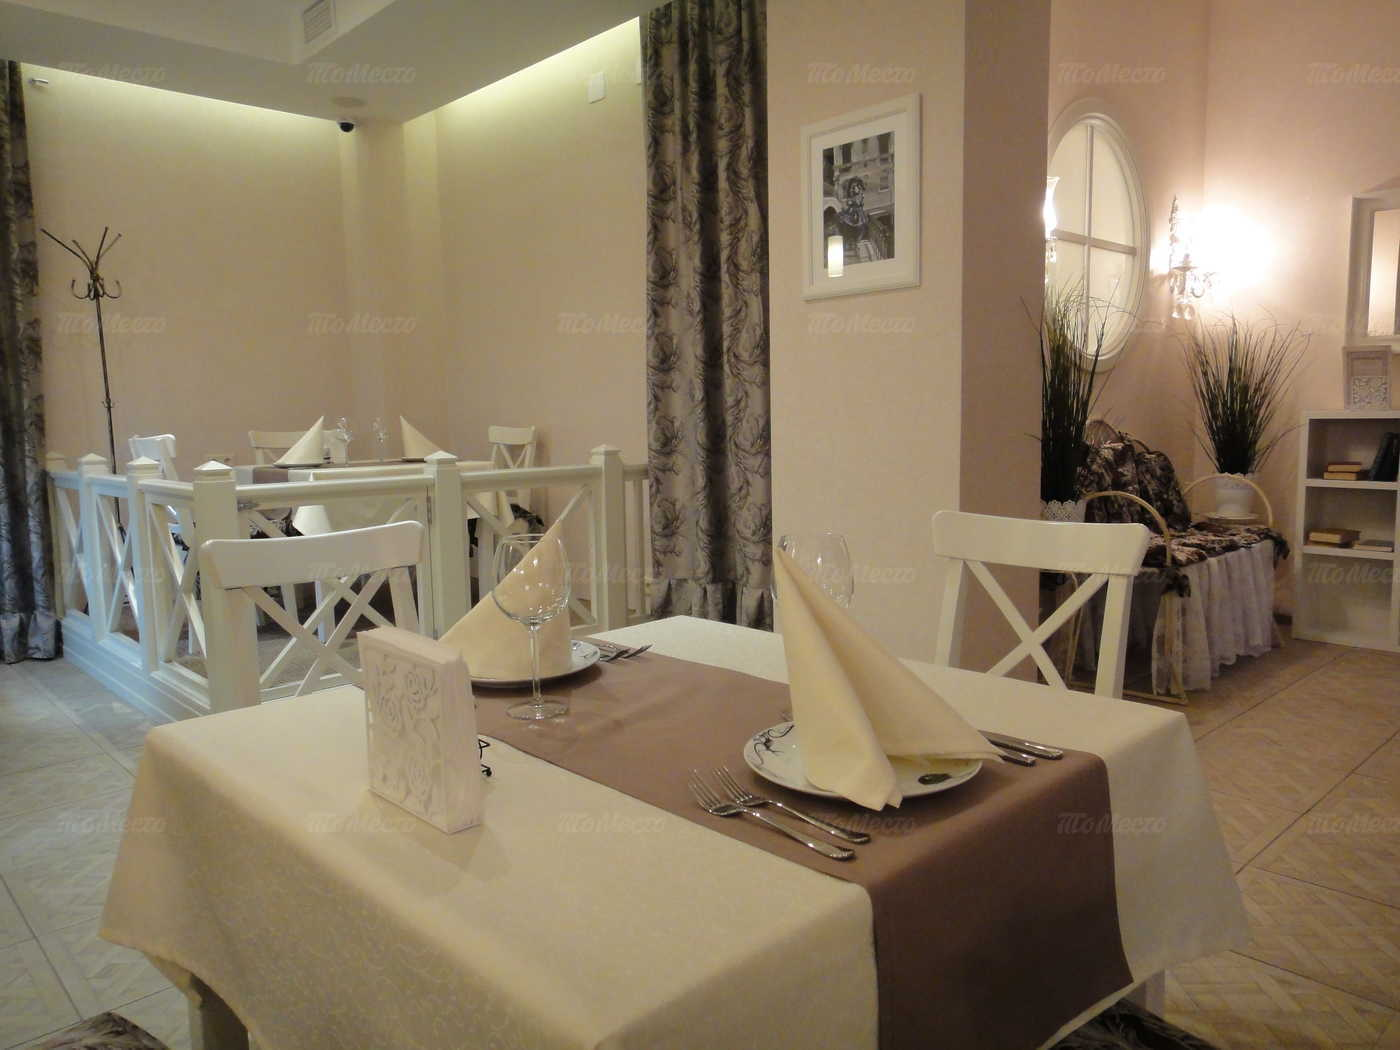 Меню ресторана Chateau Blanc (Шато Блан) на Парашютной улице